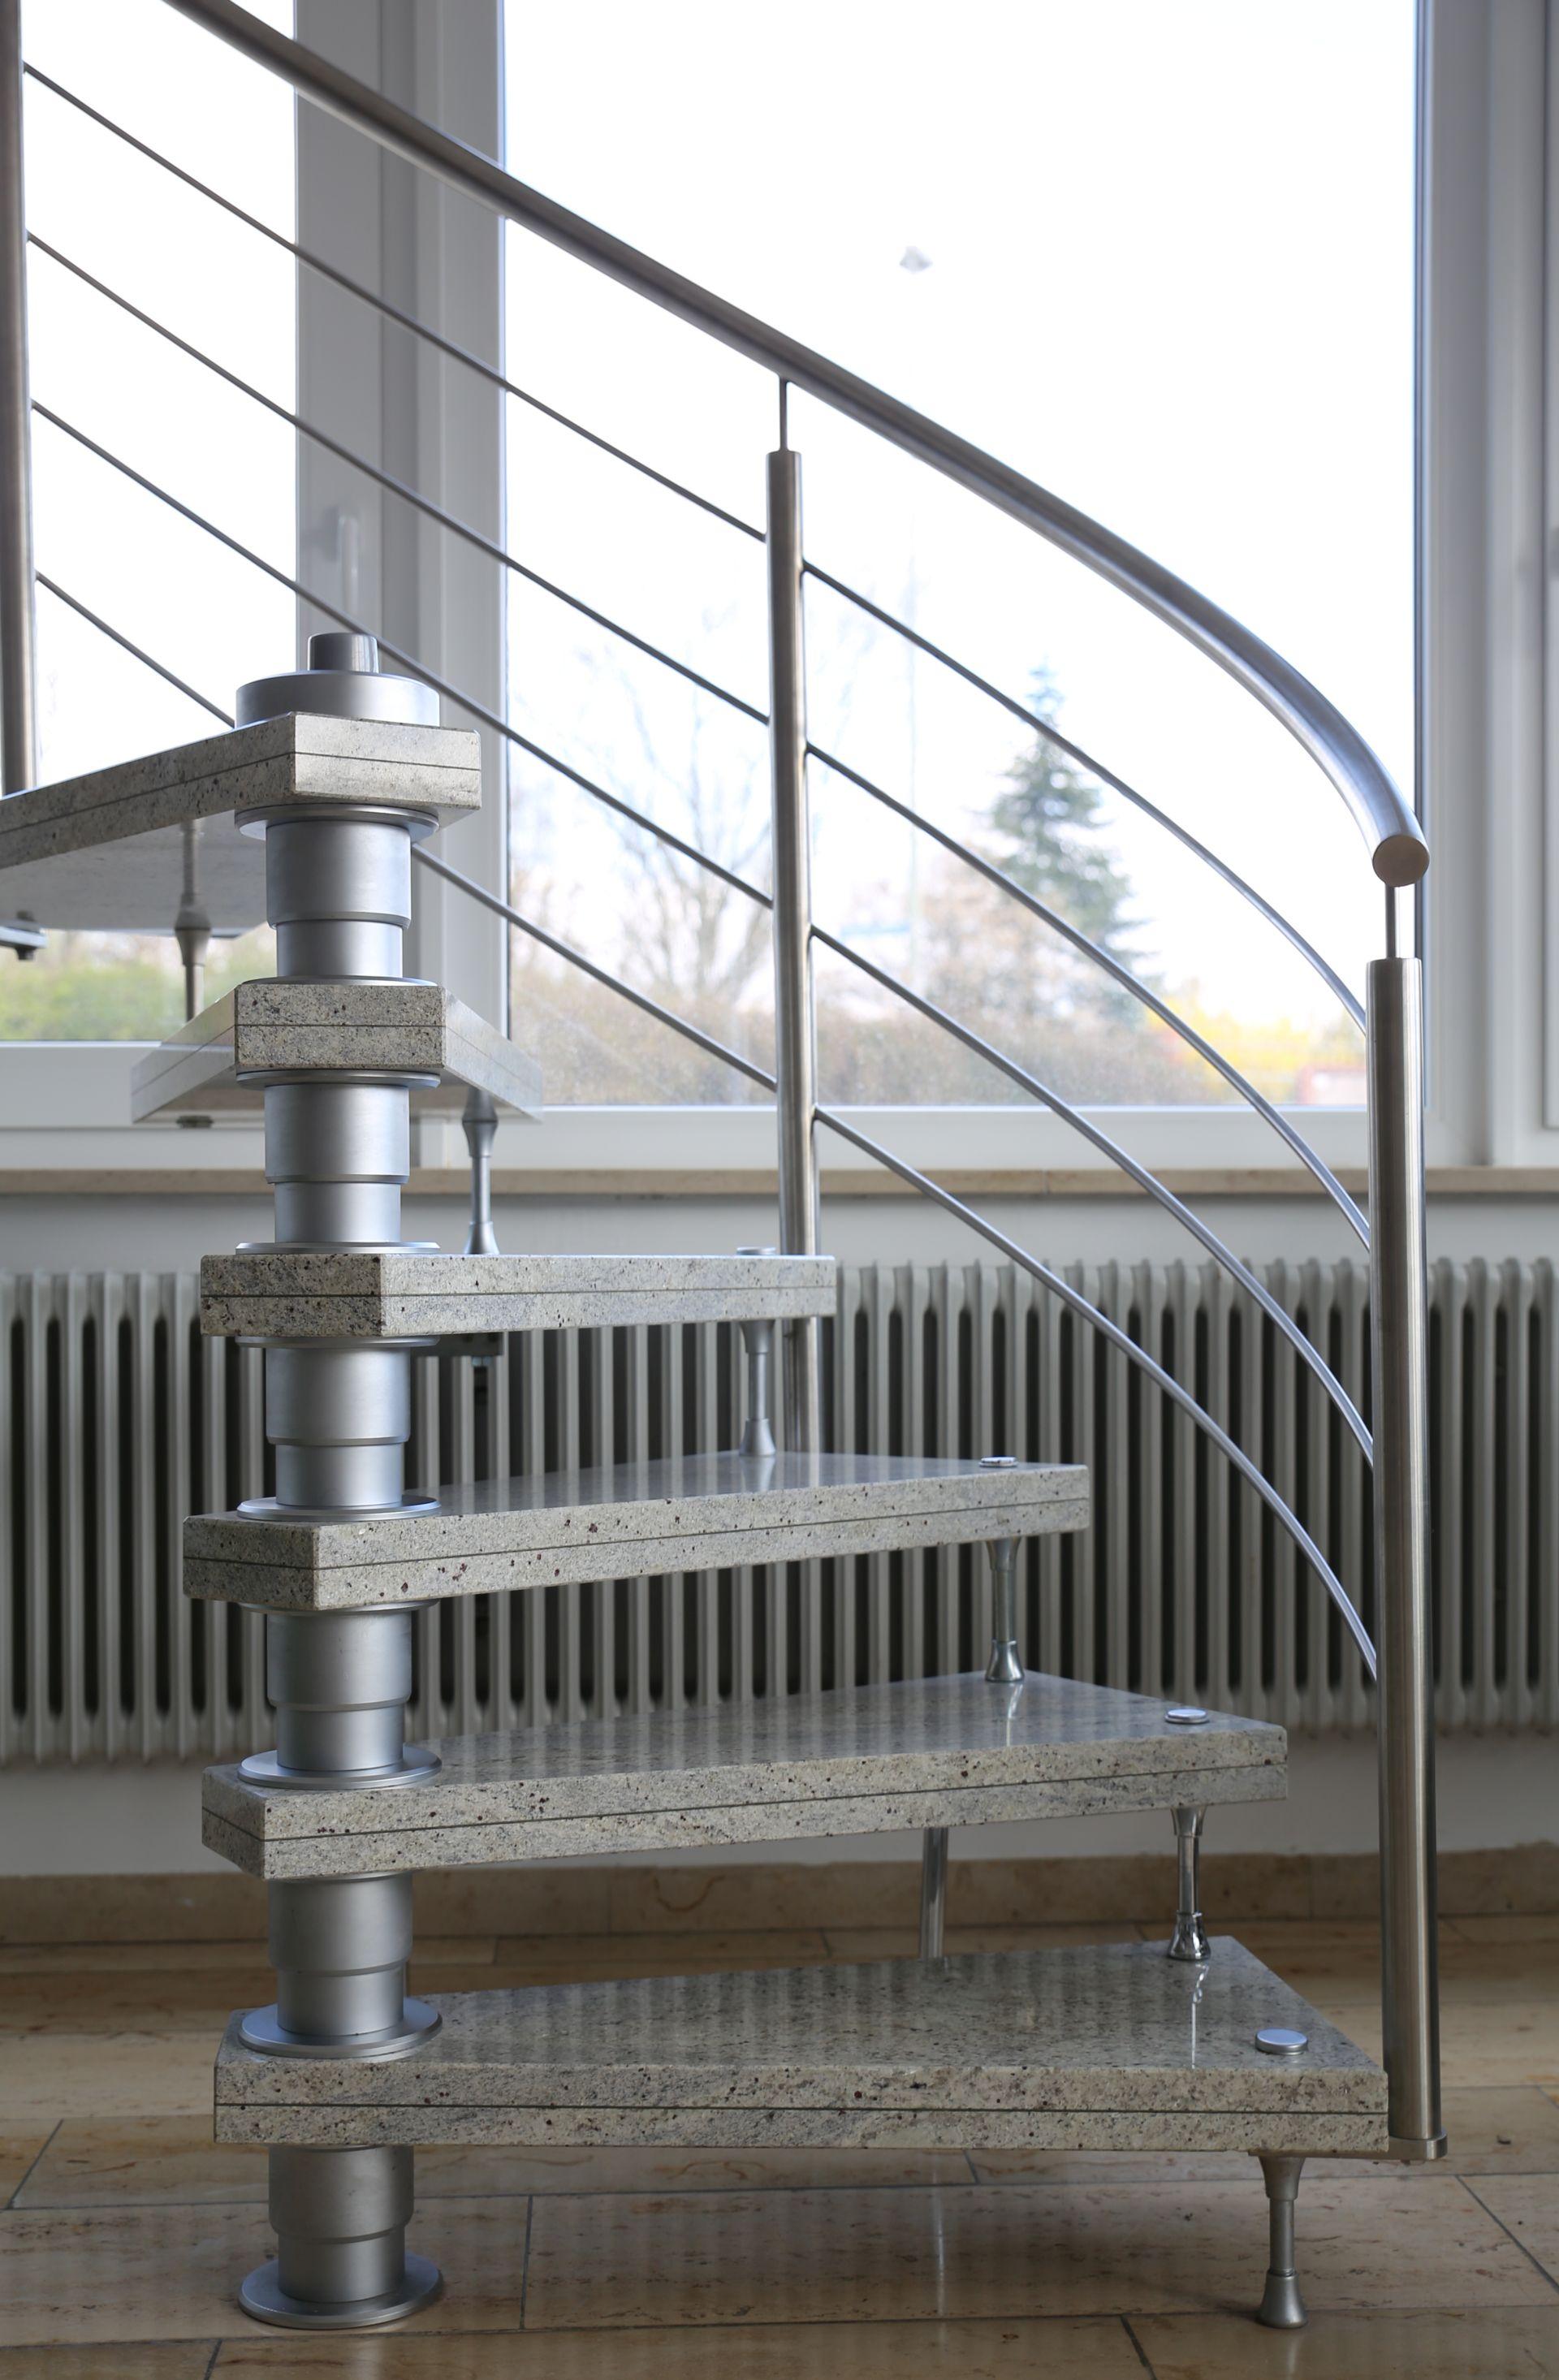 innentreppen aus granit beton marmor und naturstein wagner treppenbau mainleus. Black Bedroom Furniture Sets. Home Design Ideas